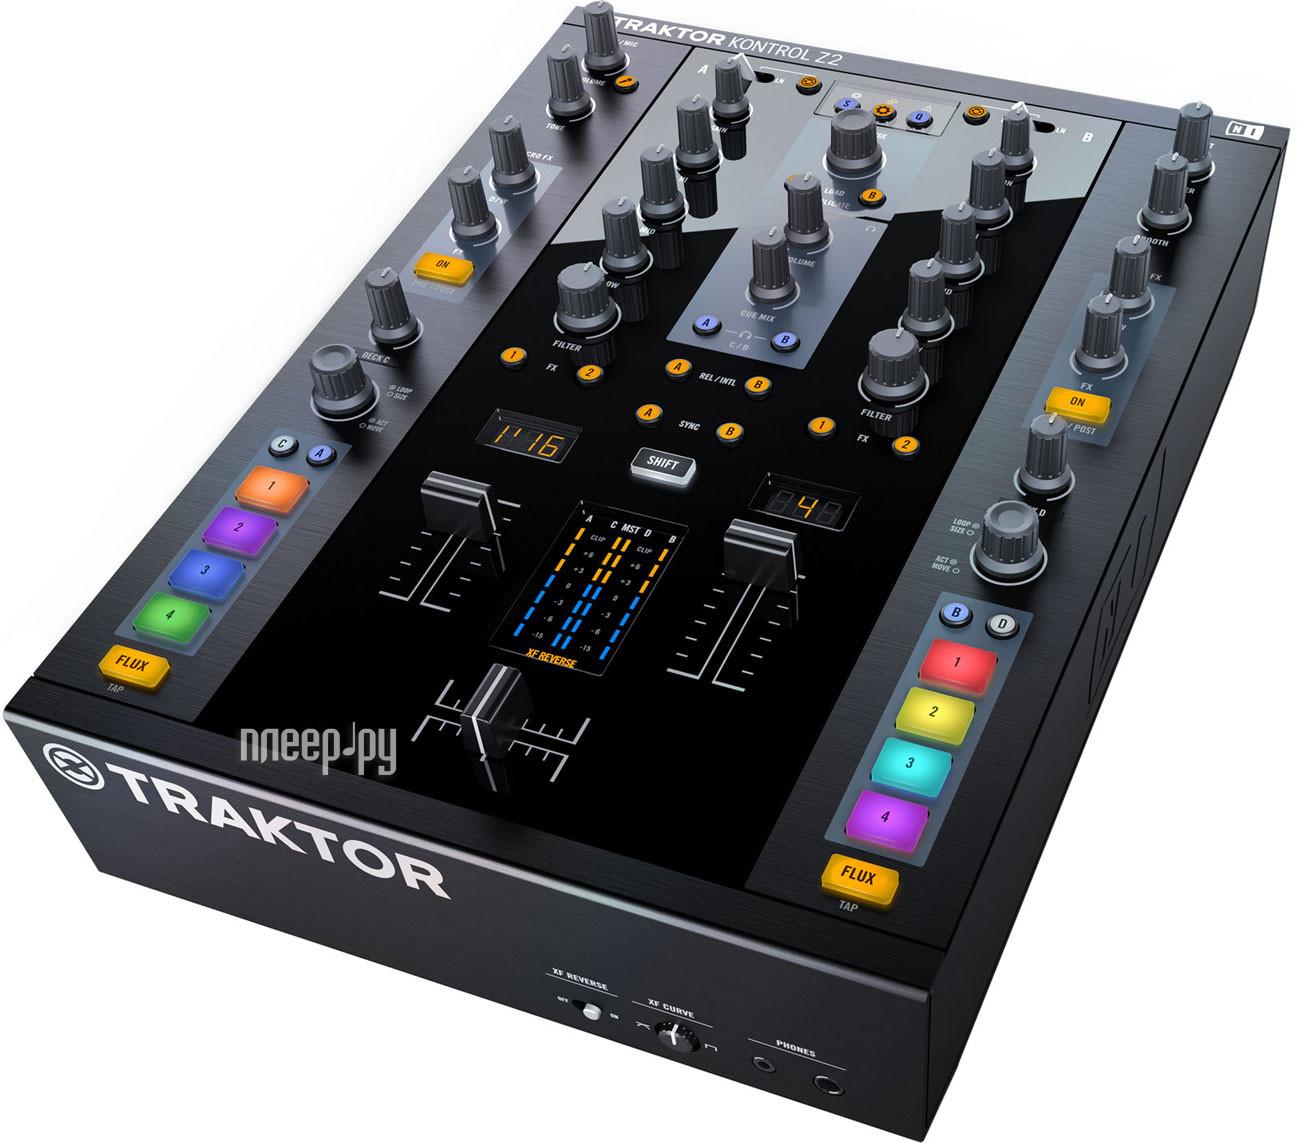 MIDI-контроллер Native Instruments Traktor Kontrol Z2